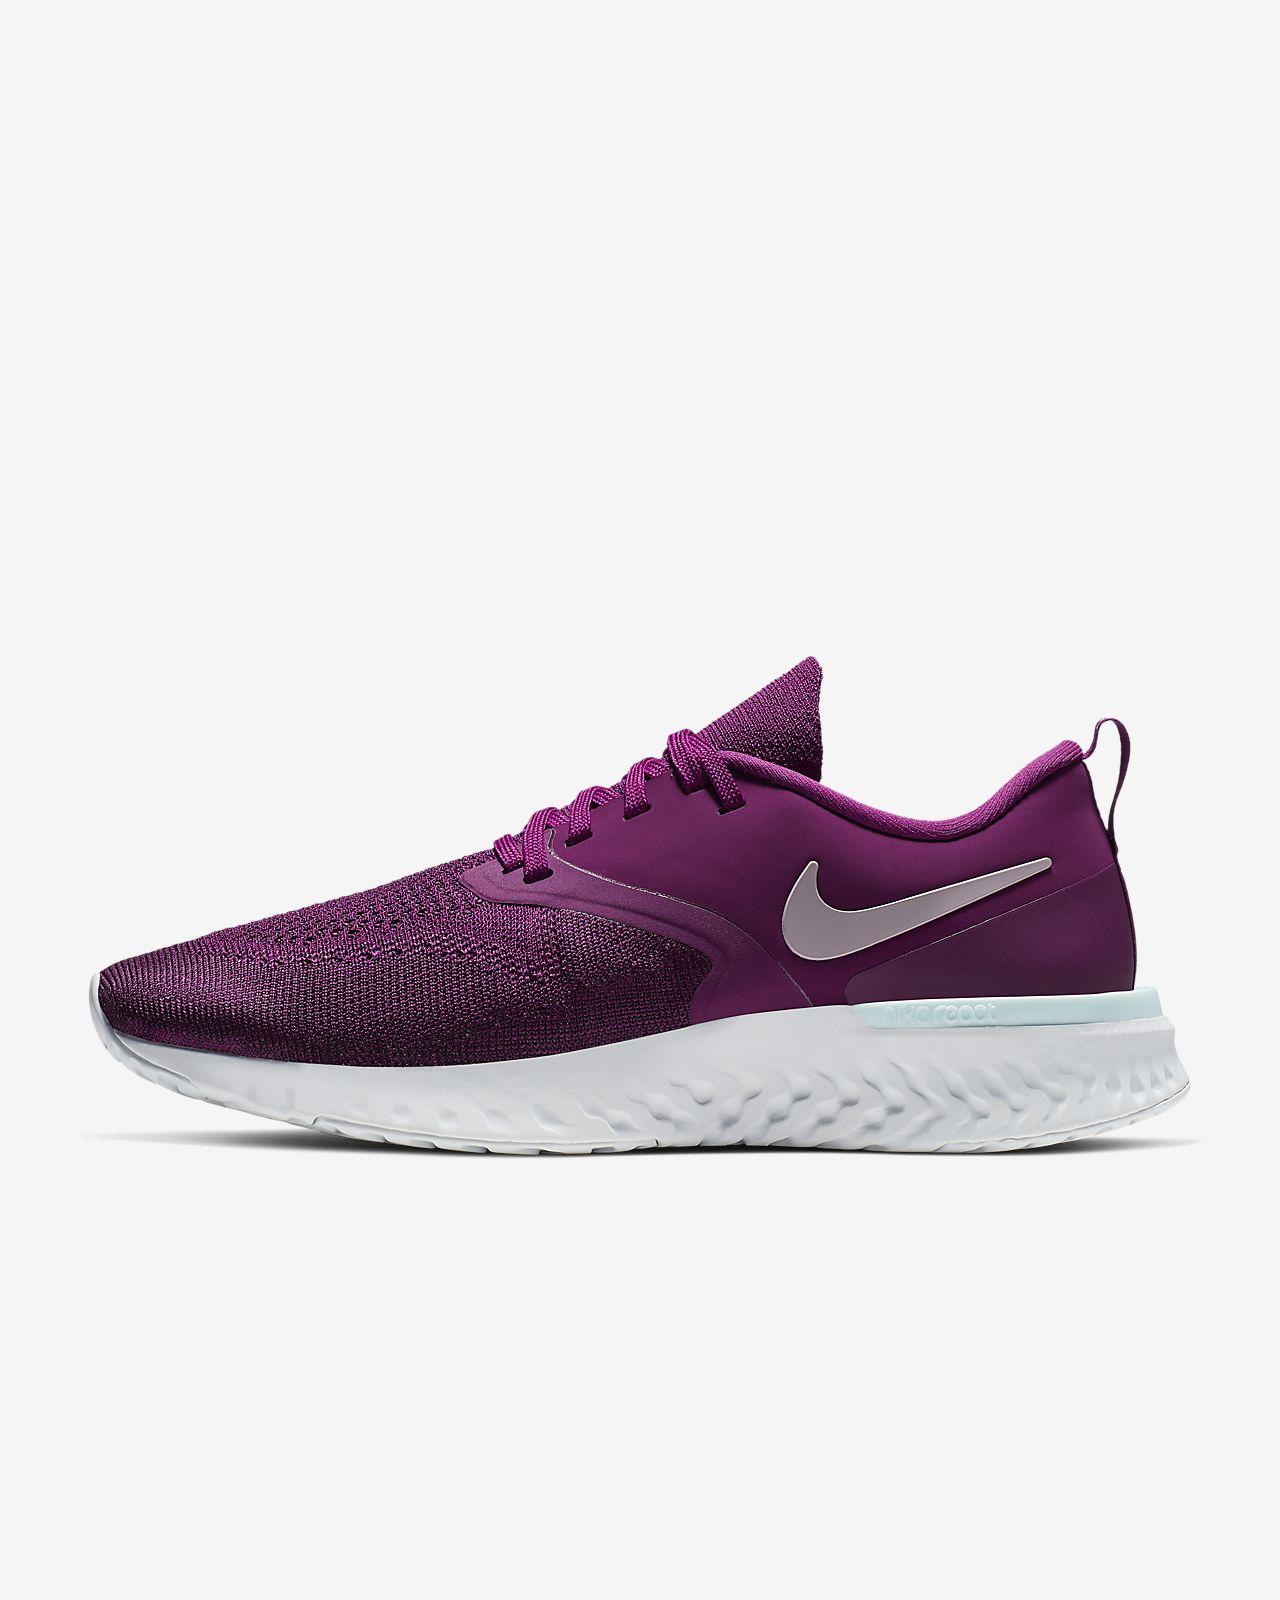 a526a79749bd Nike Odyssey React Flyknit 2 Women s Running Shoe. Nike.com NL